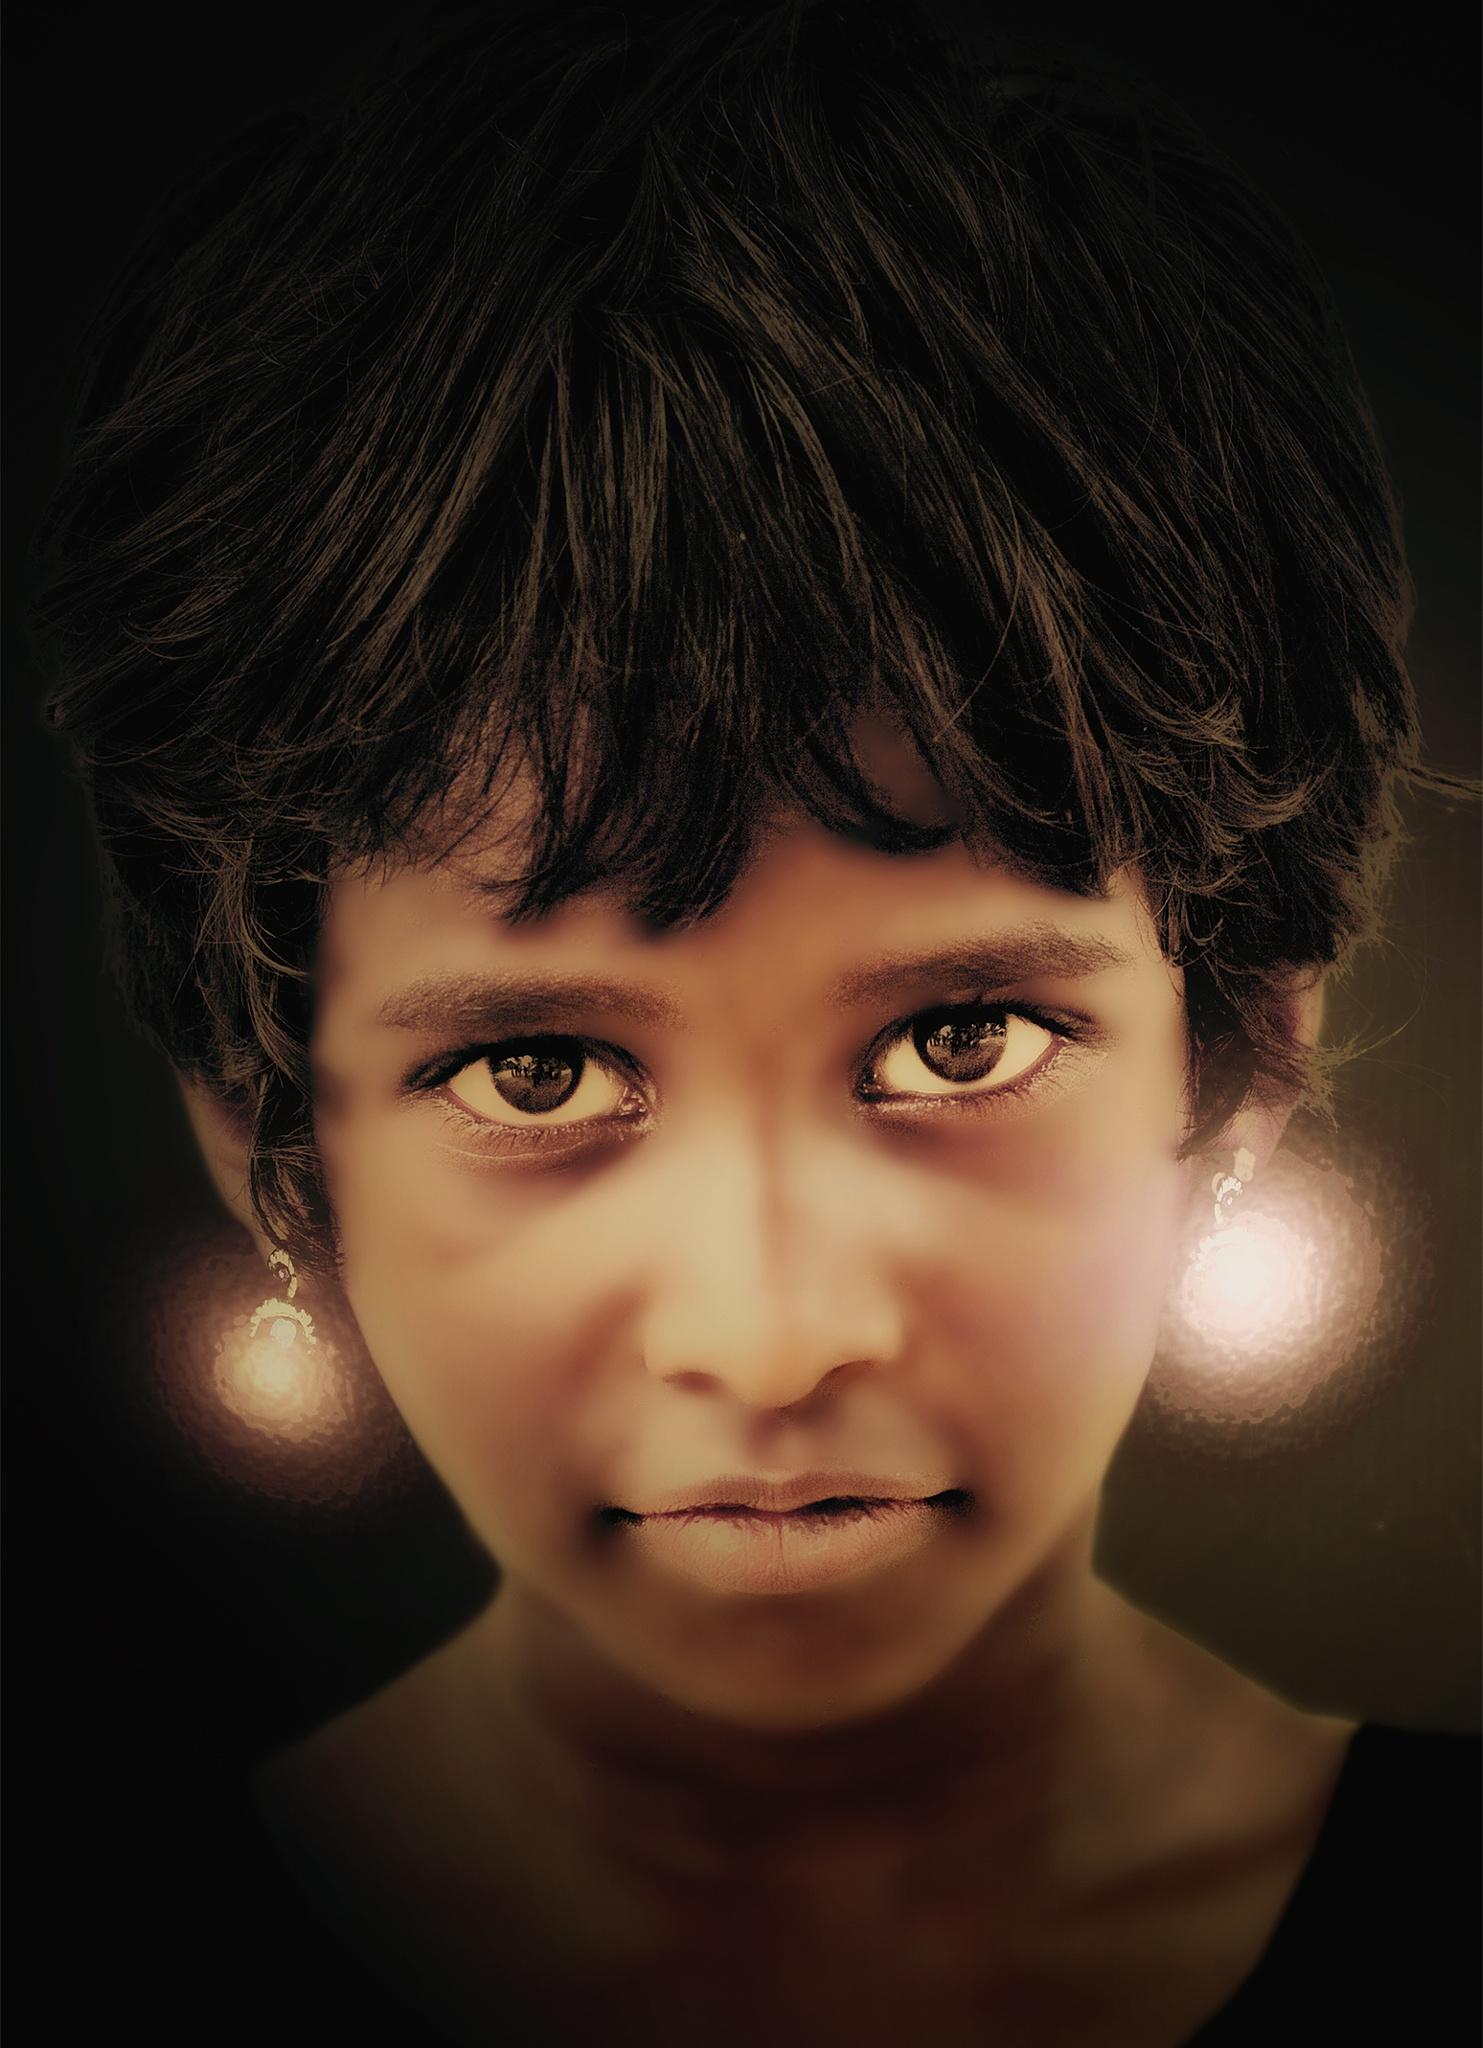 Orphan by bindue